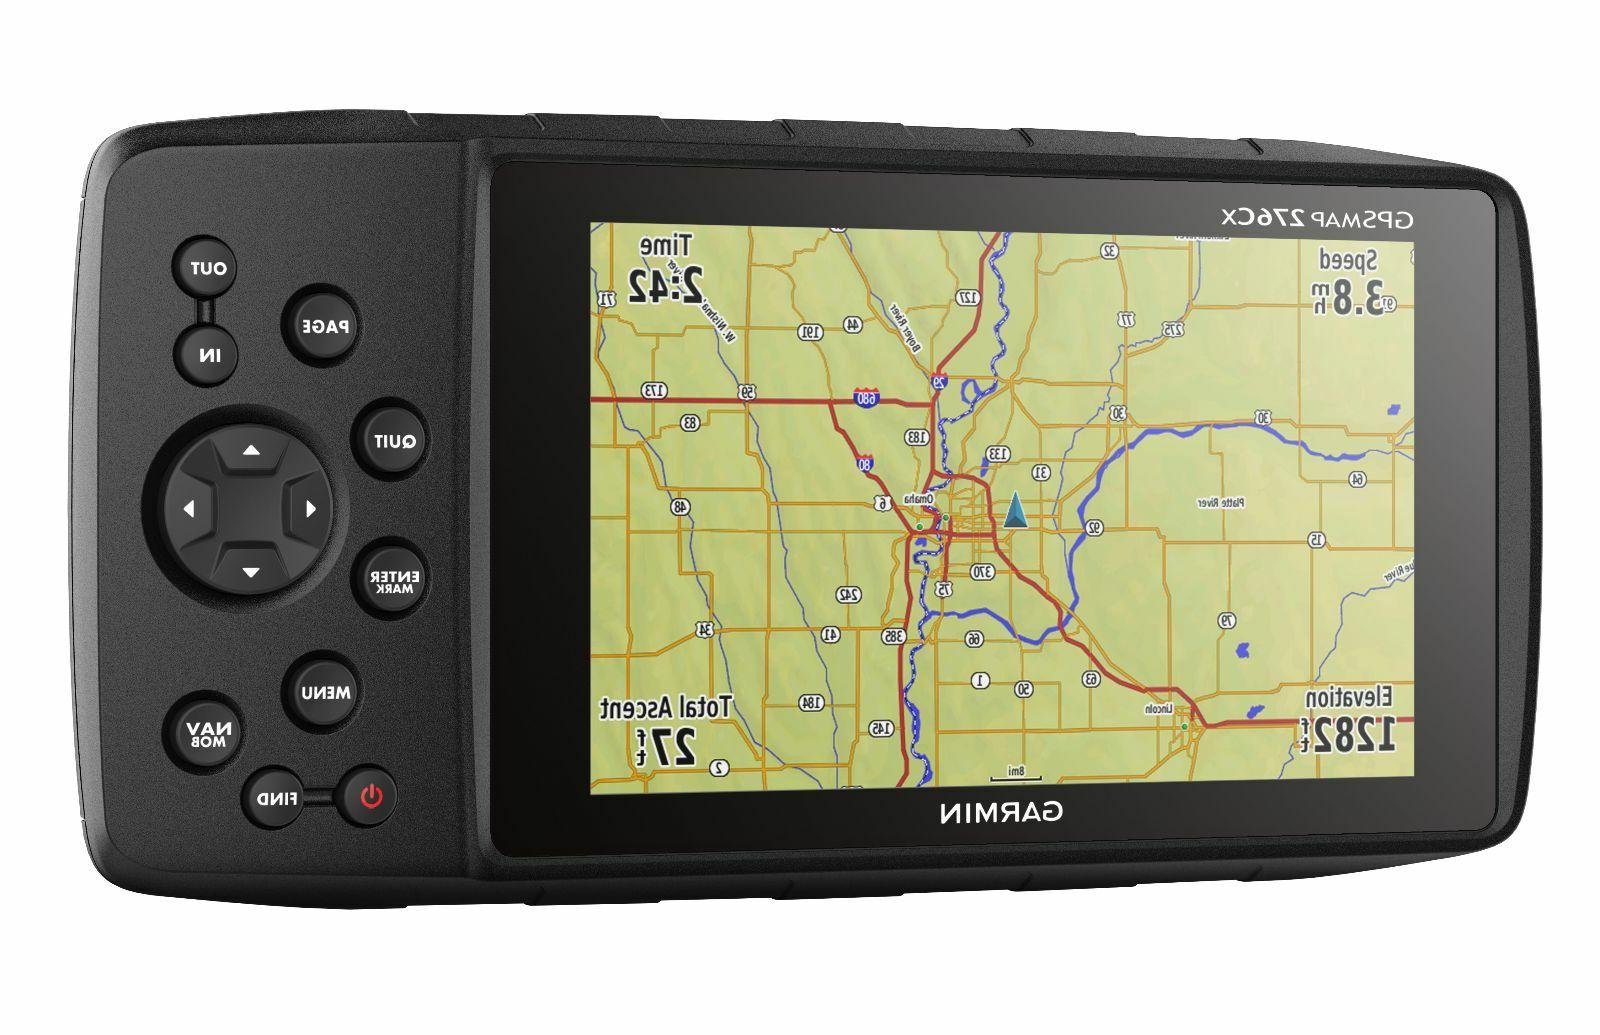 Garmin 276Cx GPS 010-01607-00